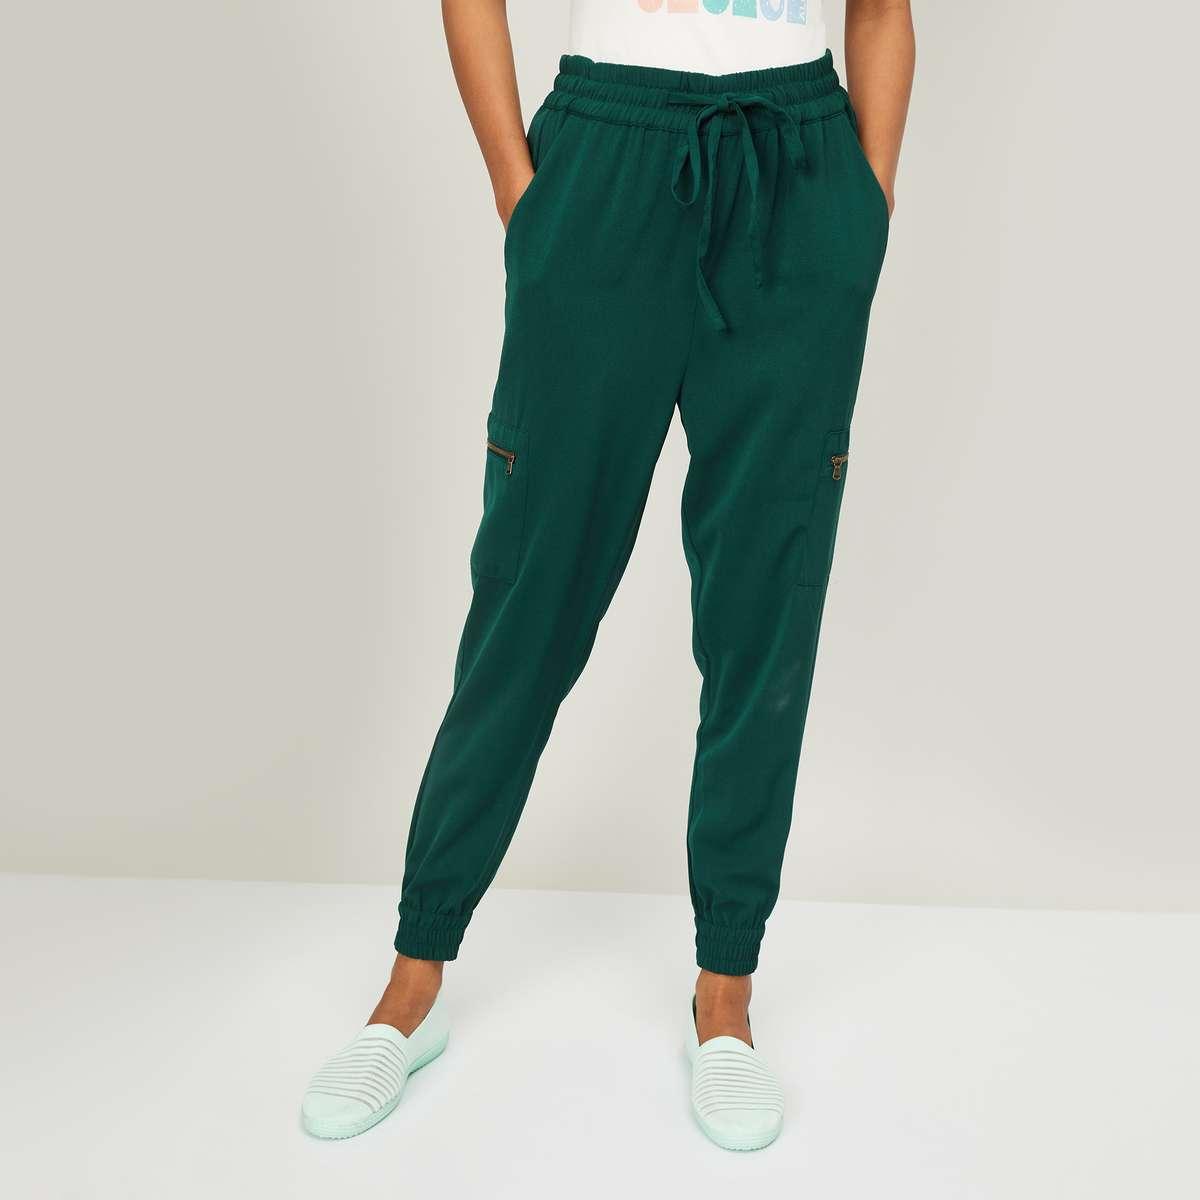 3.BOSSINI Women Solid Joggers Trousers